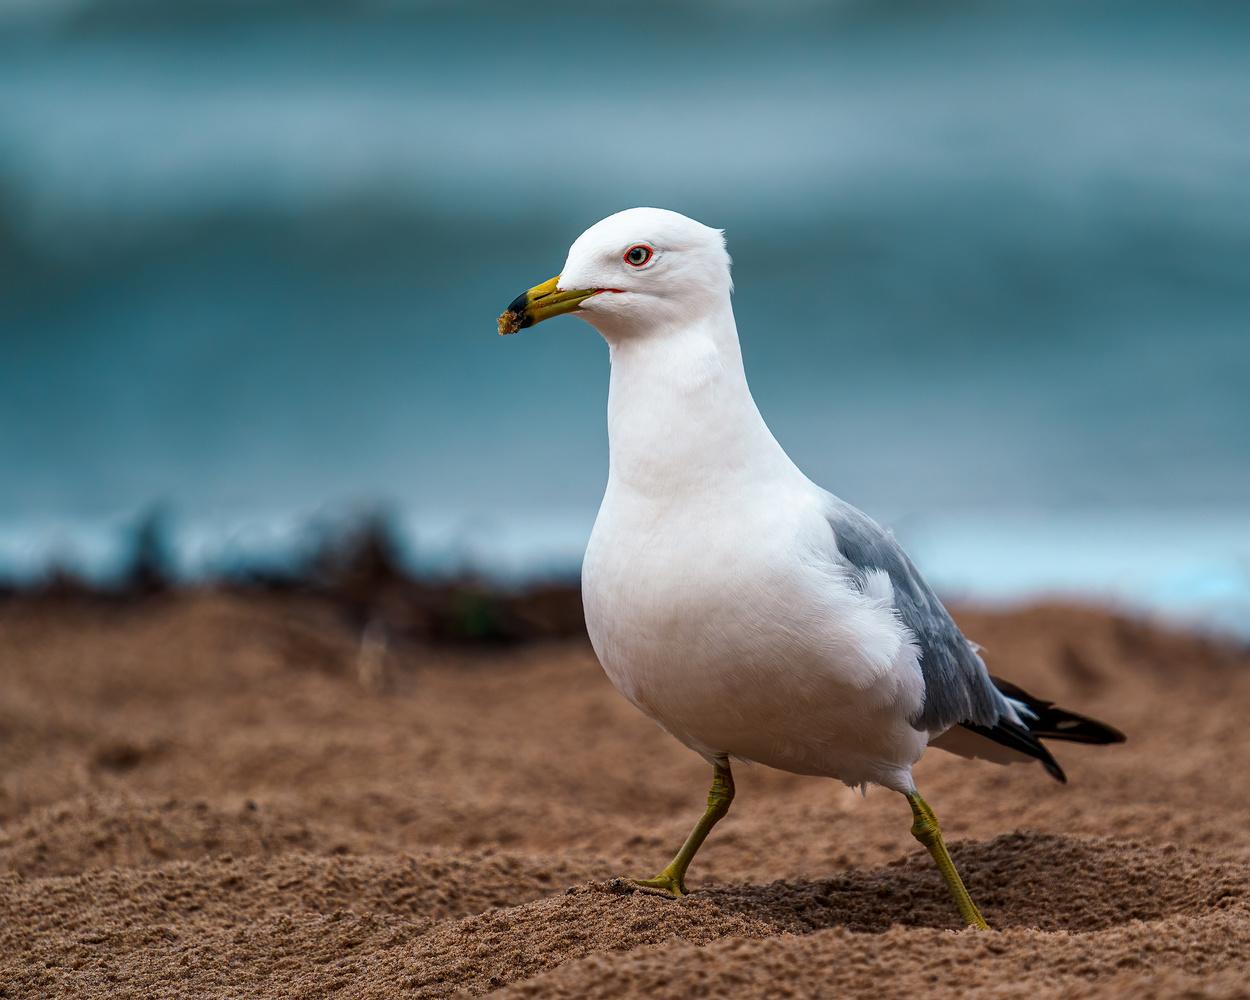 Seagulls by Skyler Ewing